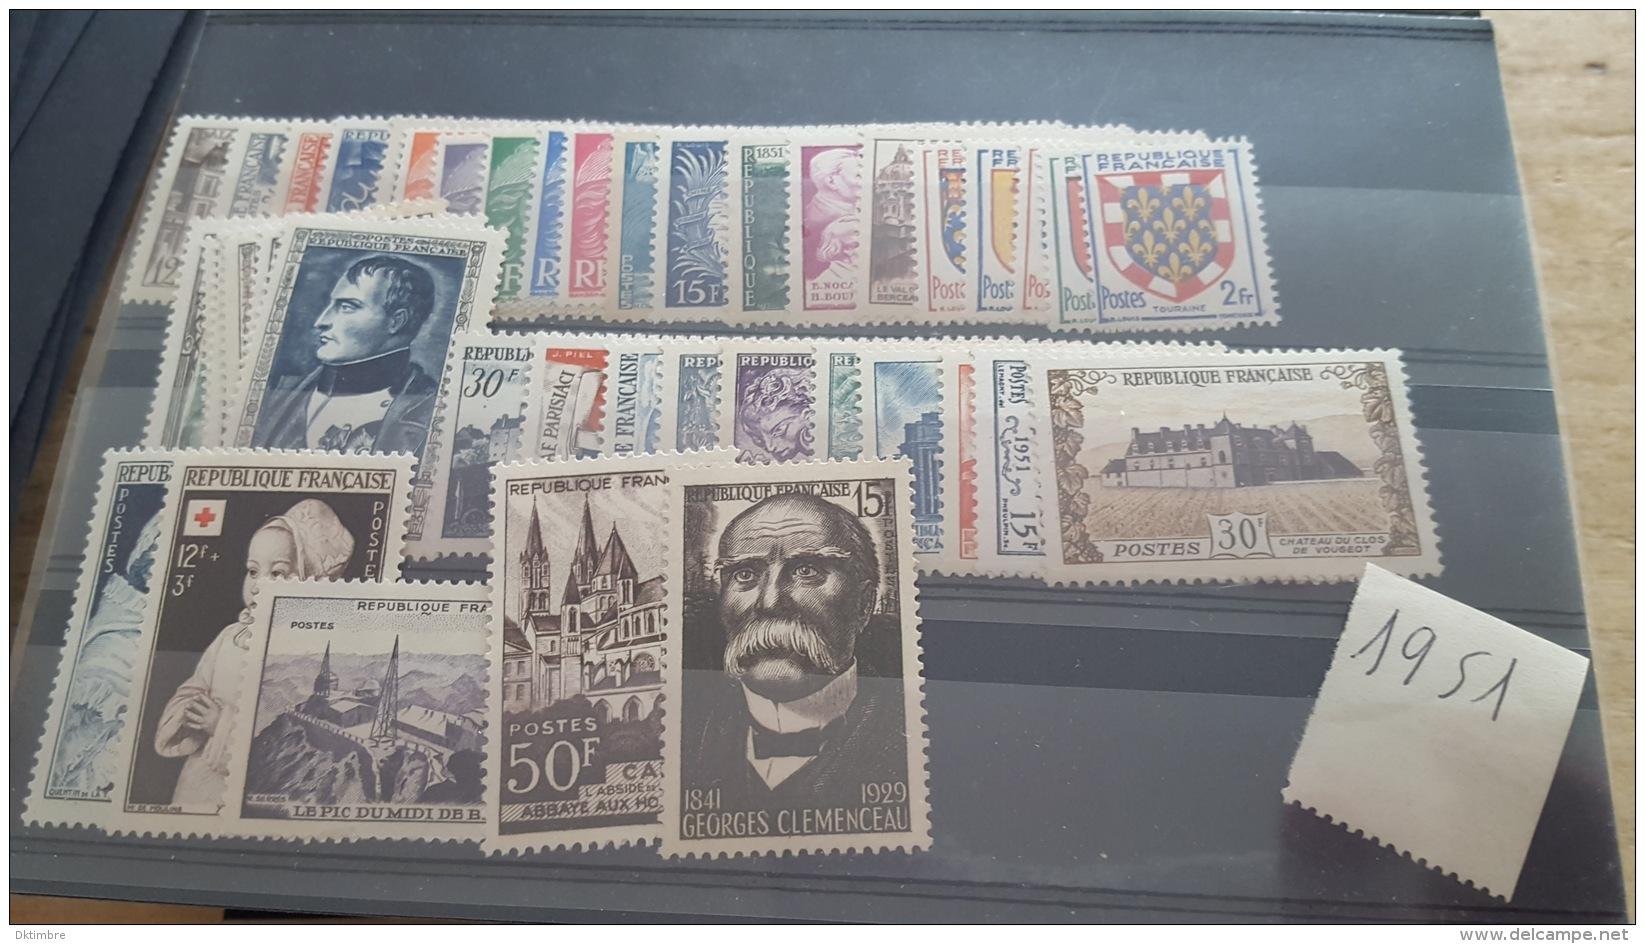 LOT 362804 TIMBRE DE FRANCE NEUF** ANNEE 1951 DEPART A 1€ - France